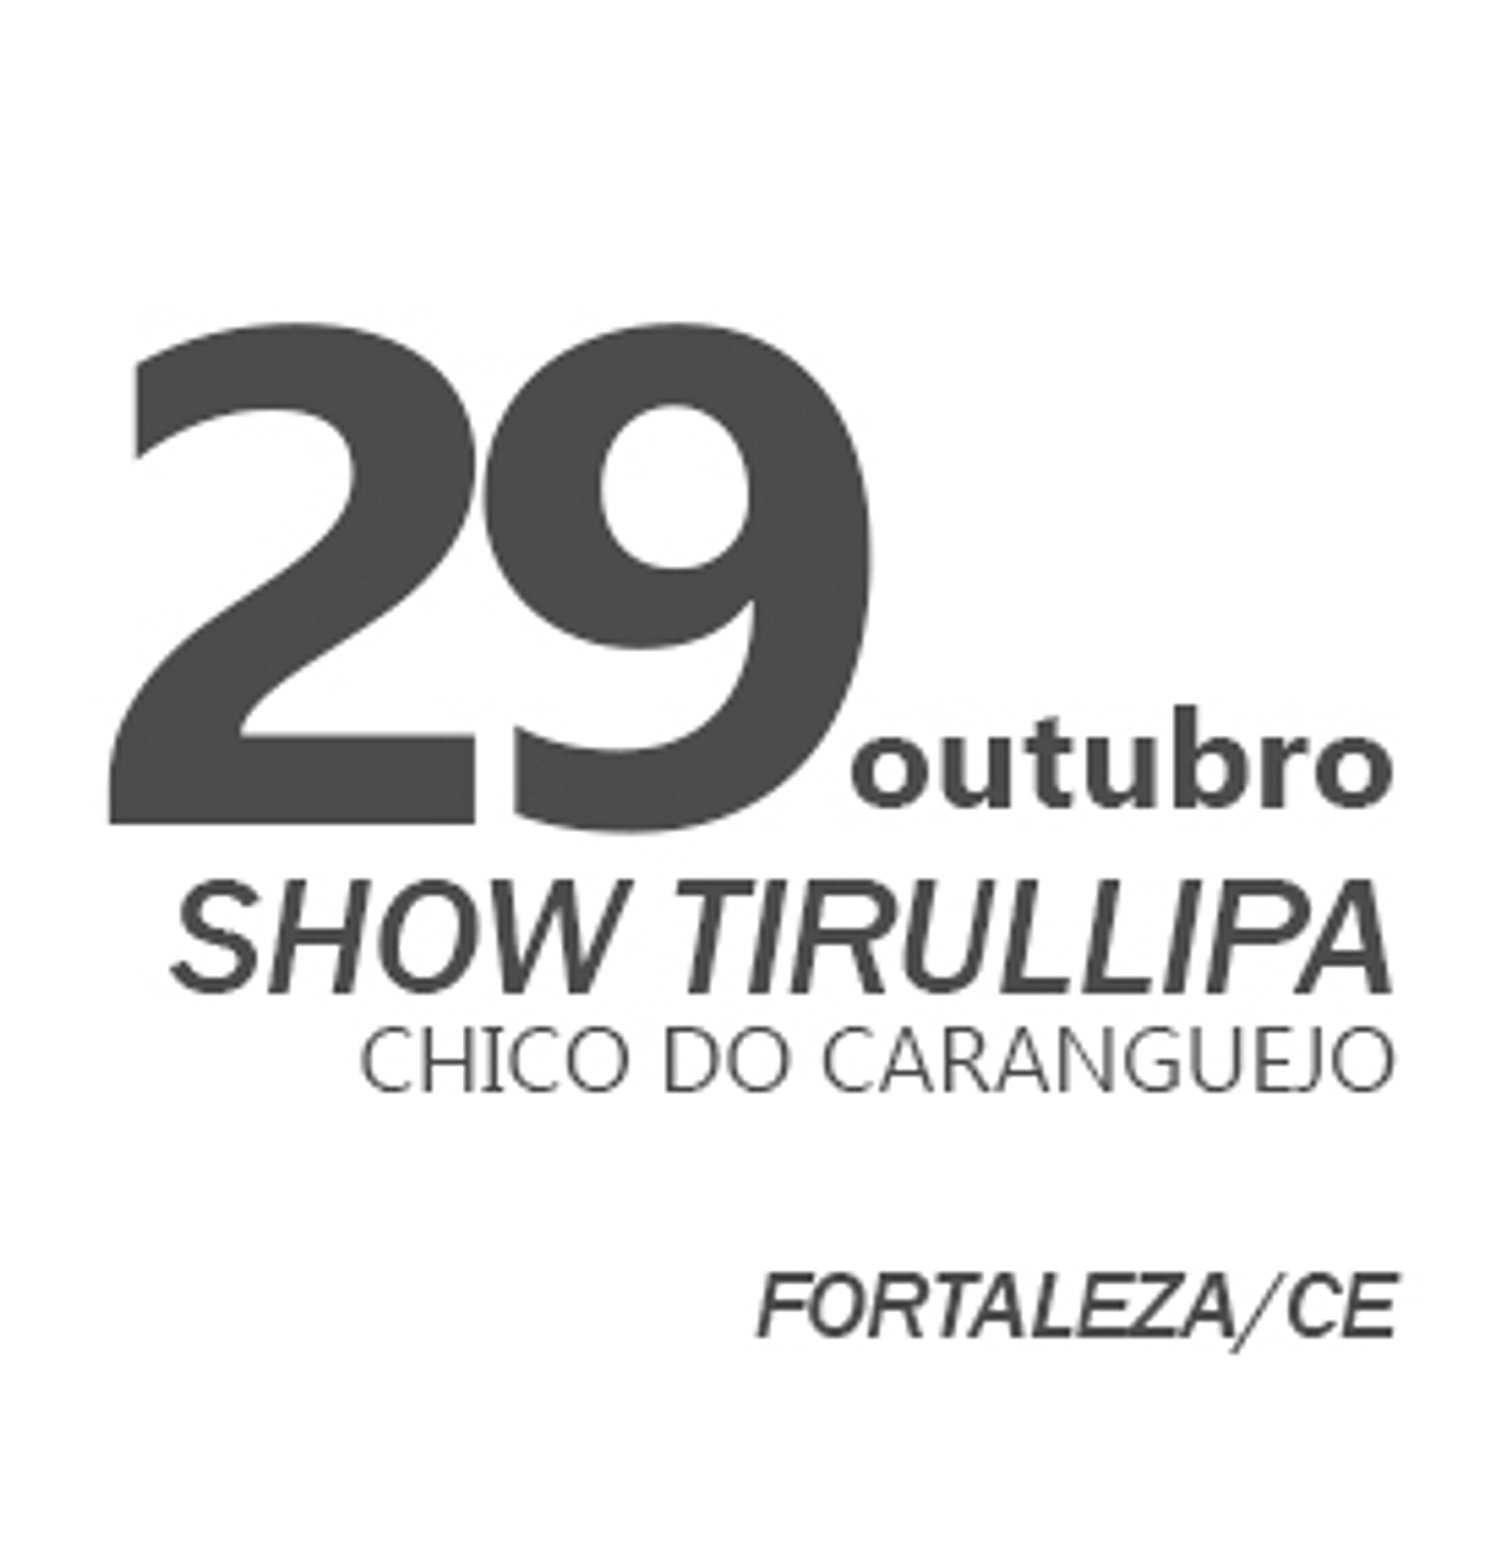 TIRULLIPA EM FORTALEZA/CE